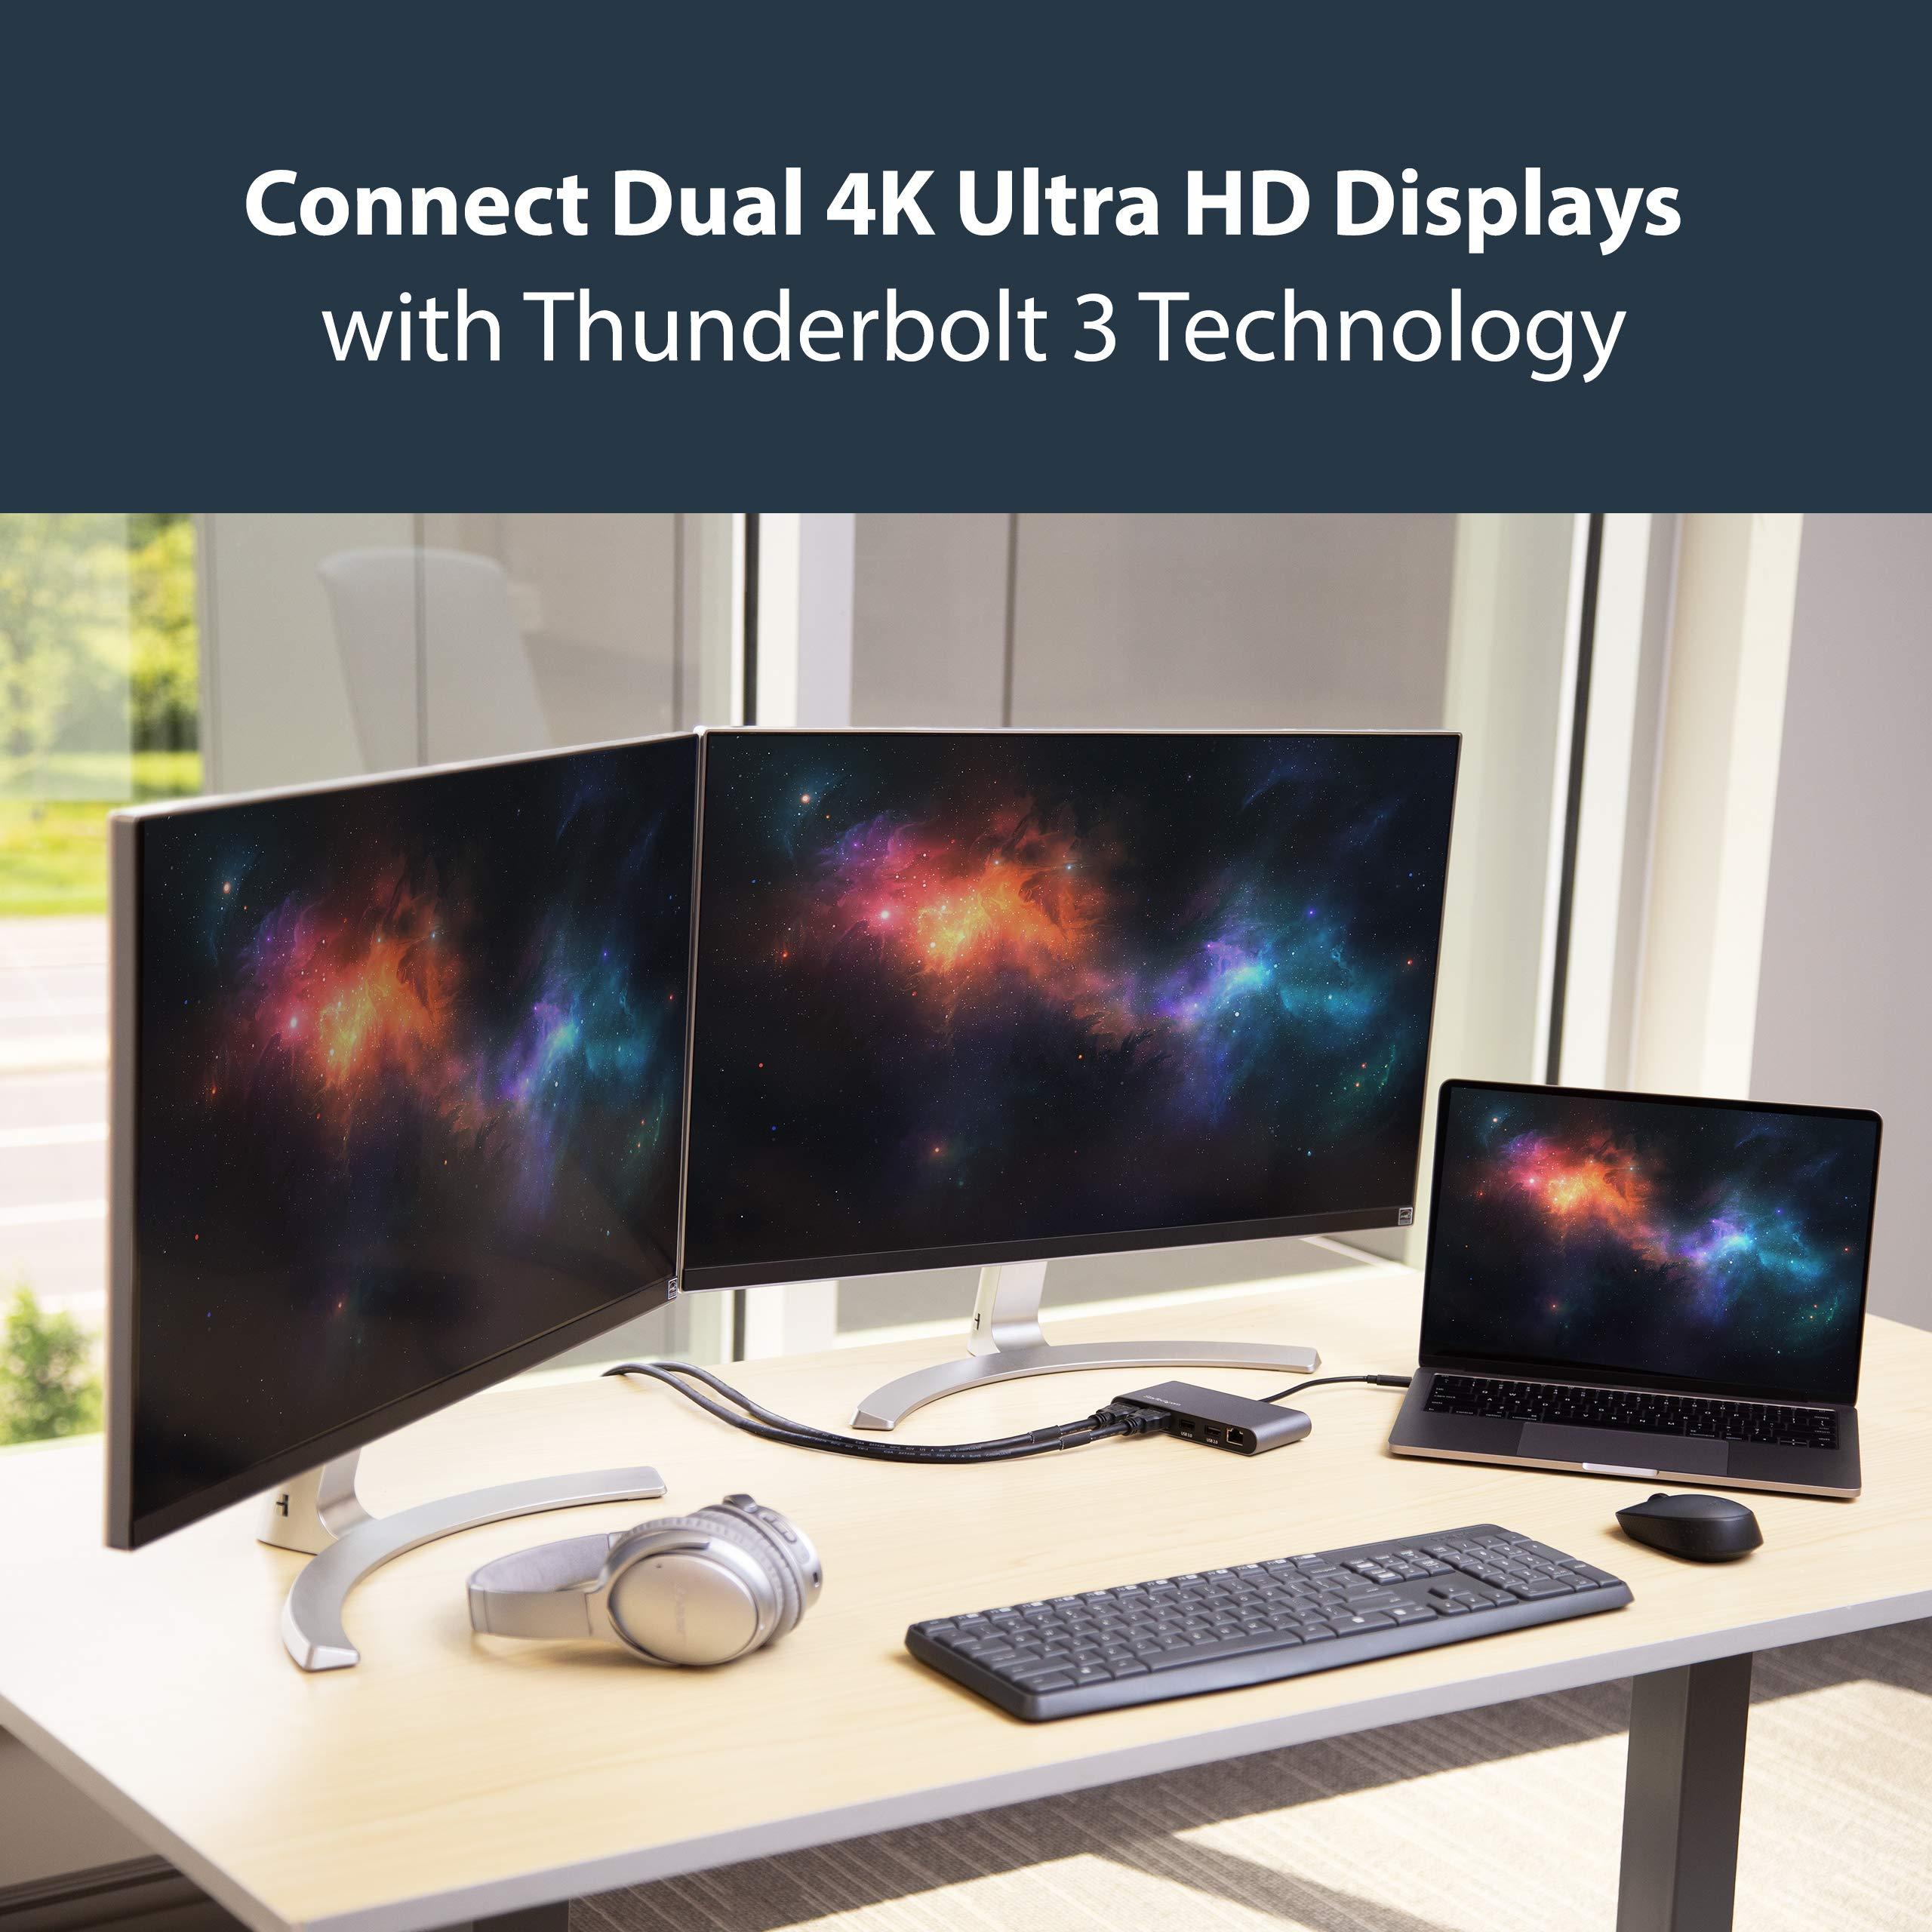 StarTech.com Mini Dual 4K Monitor Thunderbolt 3 Dock with HDMI - Mac & Windows (TB3DKM2HD) by StarTech (Image #4)